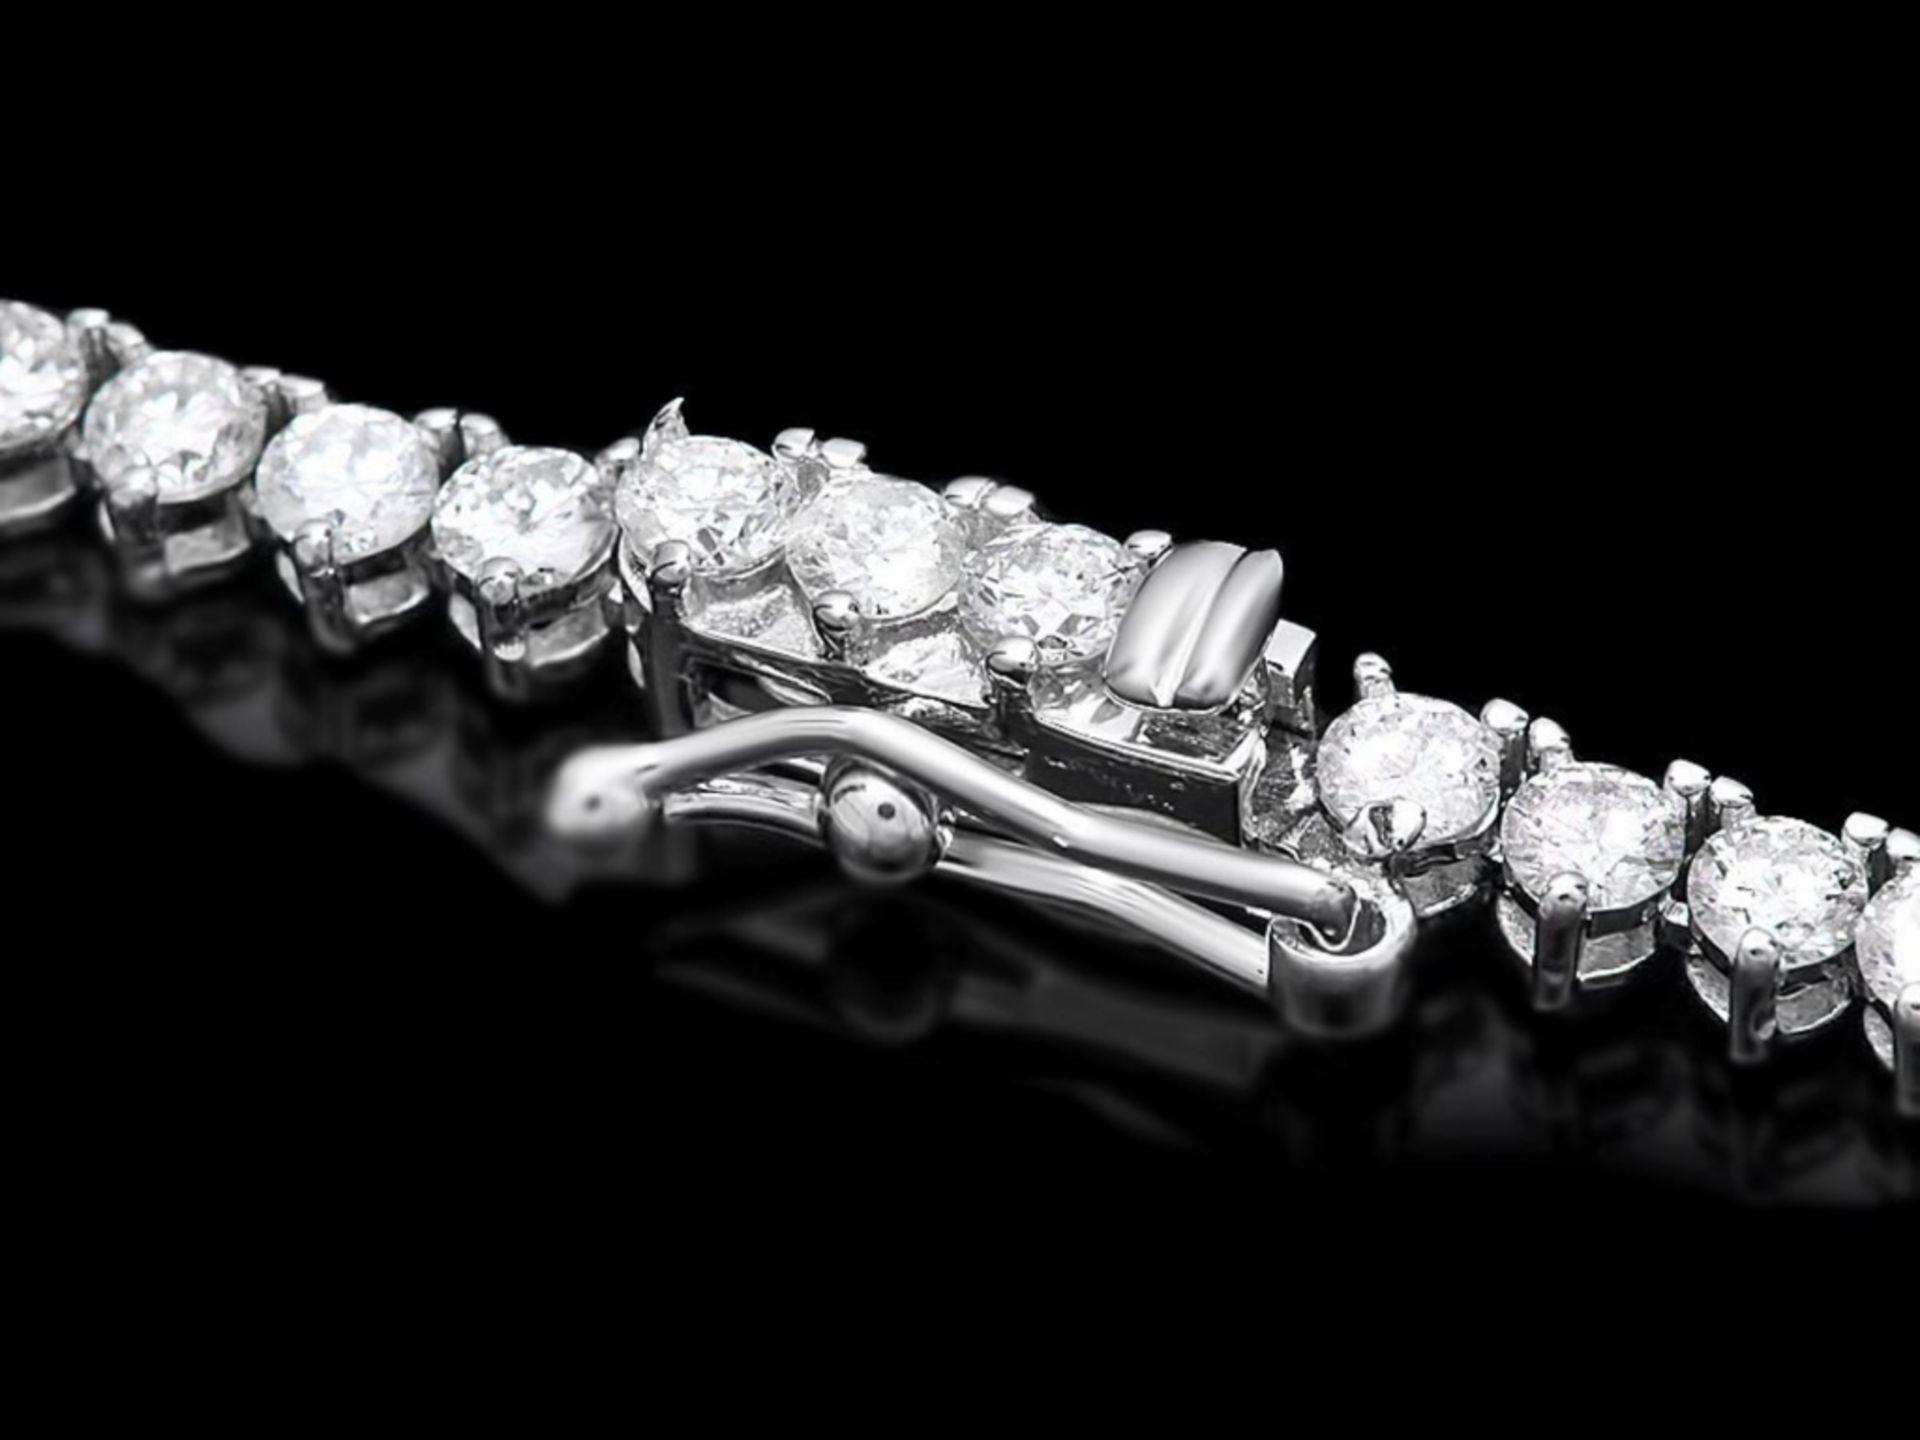 ^18k White Gold 10.00ct Diamond Necklace - Image 4 of 5